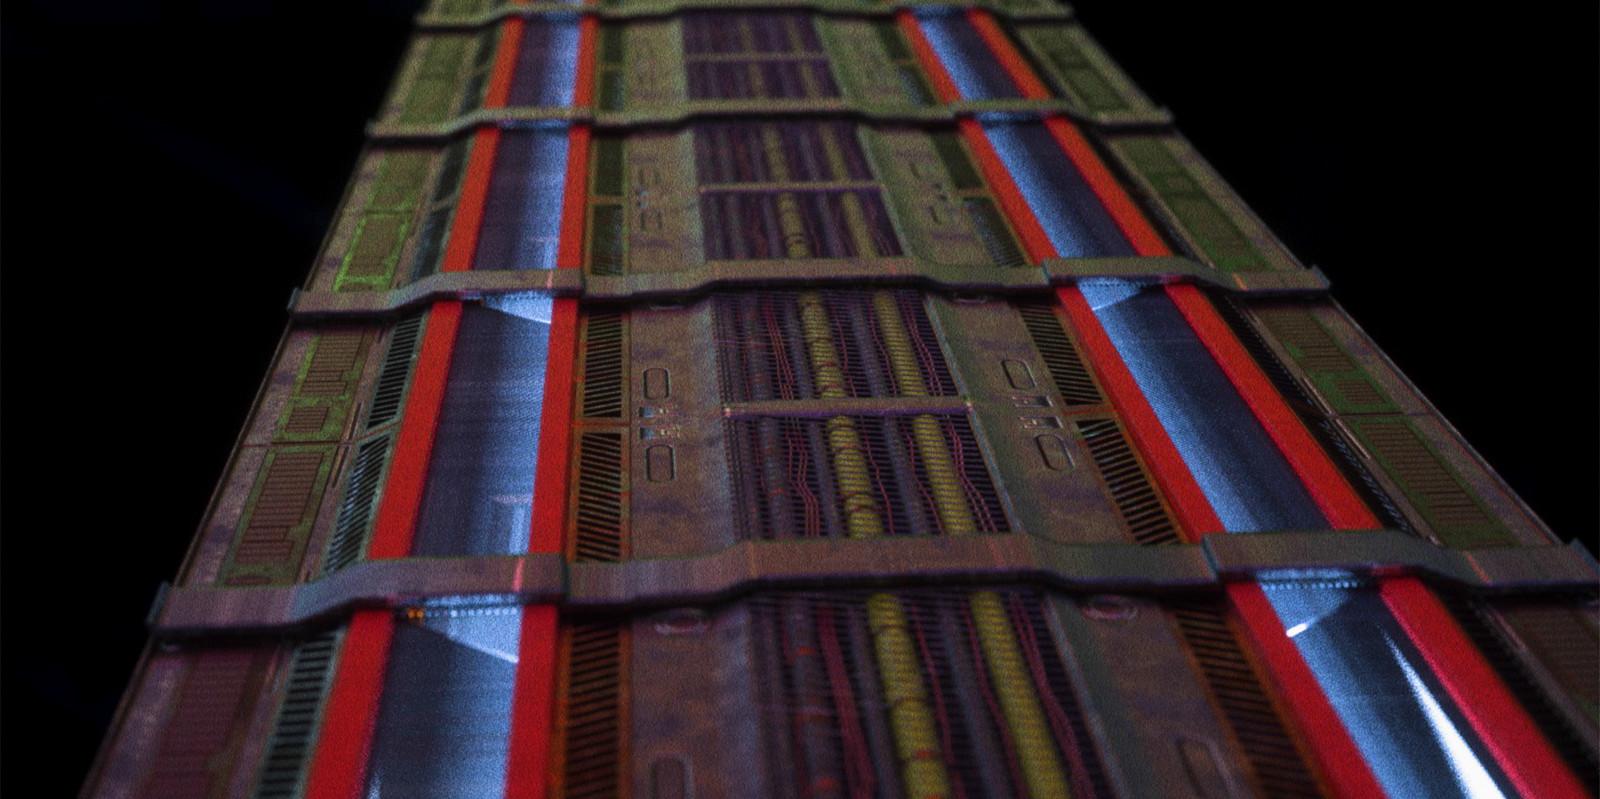 Asset of the project: Floor (Modeled: Cinema4D, textured: Substance Painter, rendered: Octane Render)